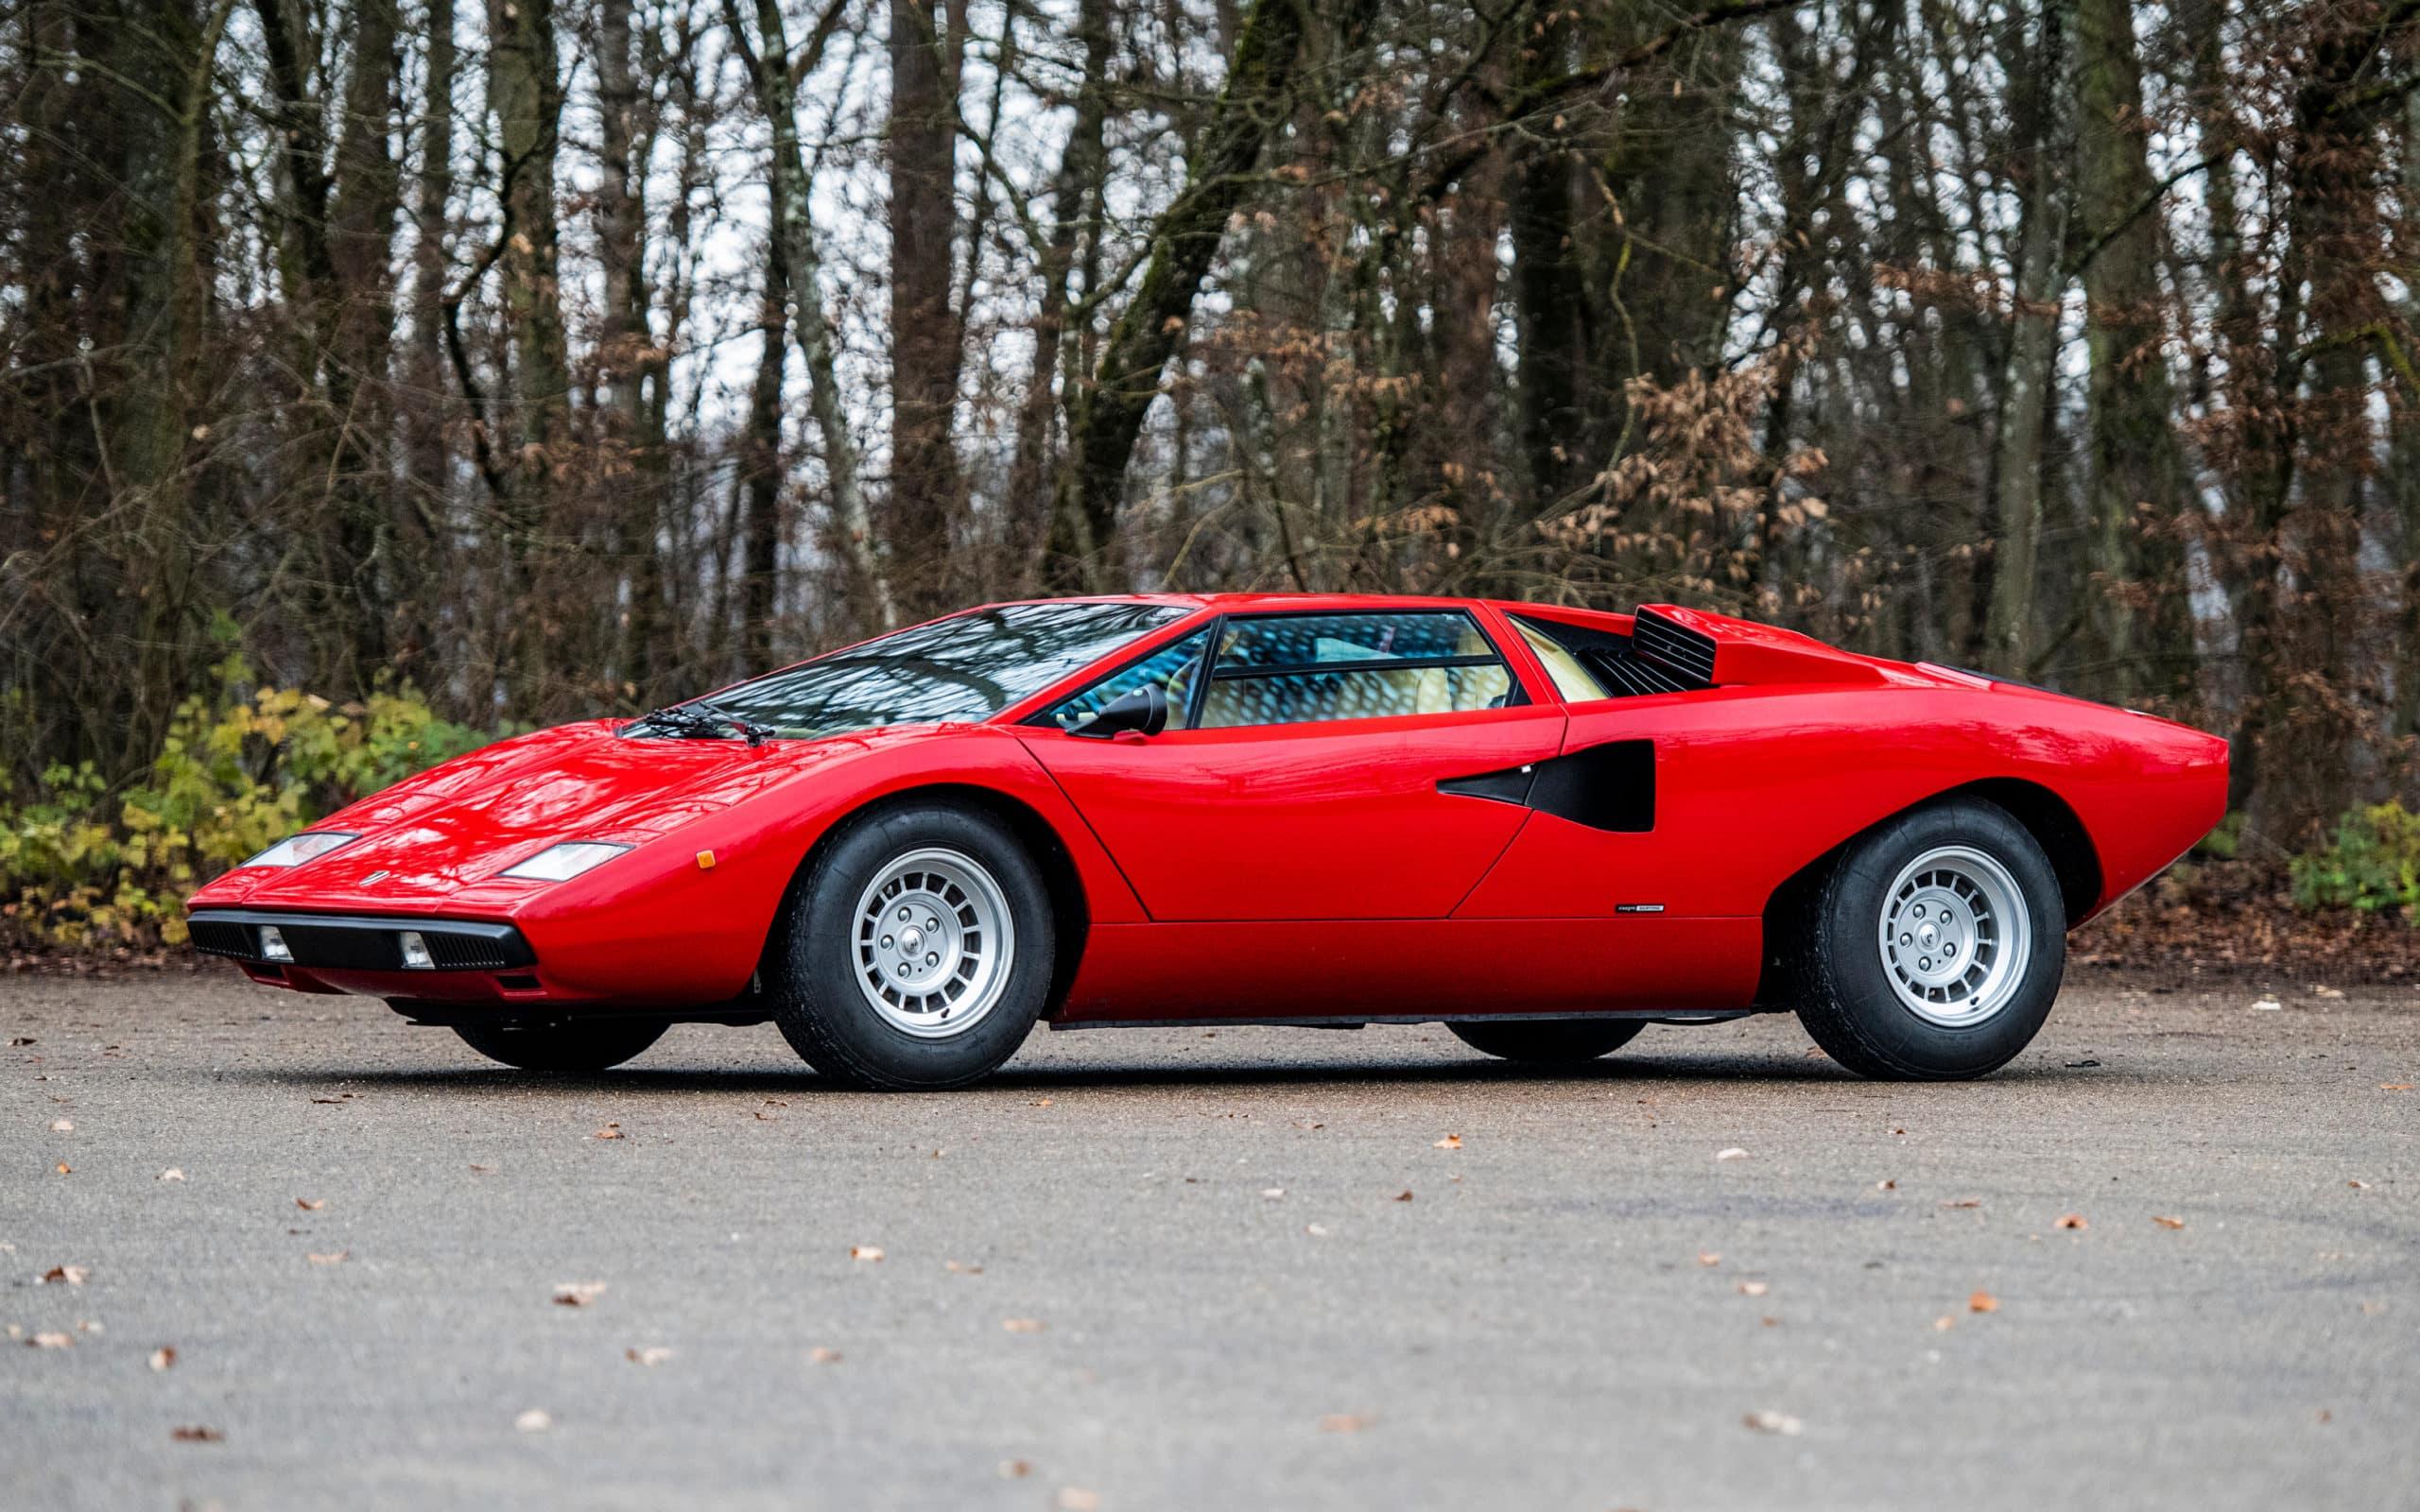 Rod Stewart's 1977 Lamborghini Countach LP400 'Periscopio'